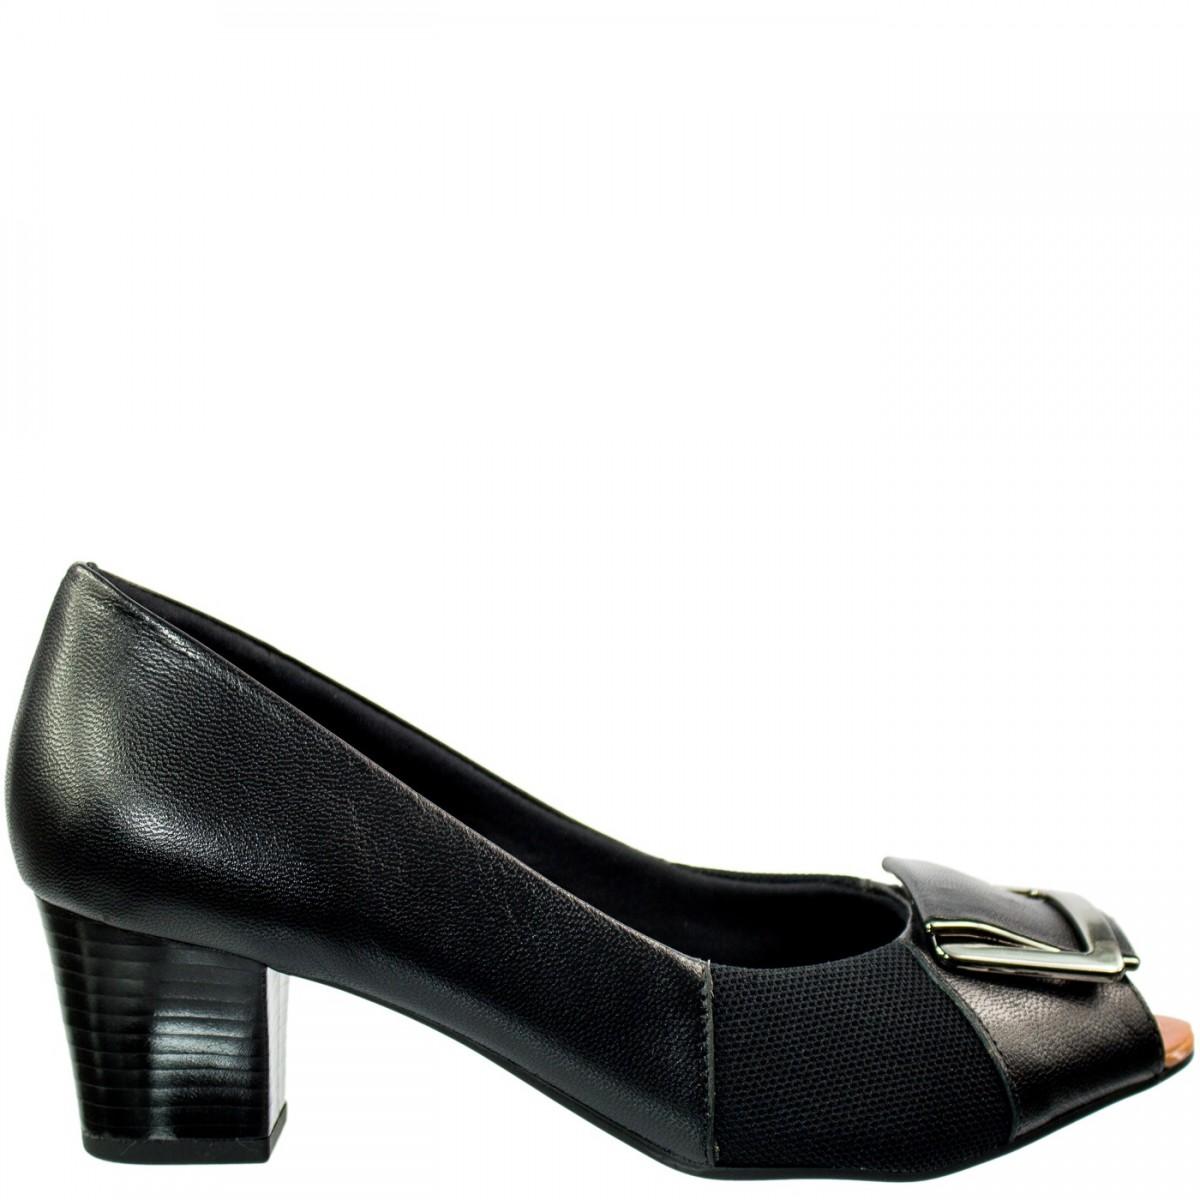 7a4c523a90 Bizz Store - Sapato Peep Toe Feminino Usaflex Para Joanetes